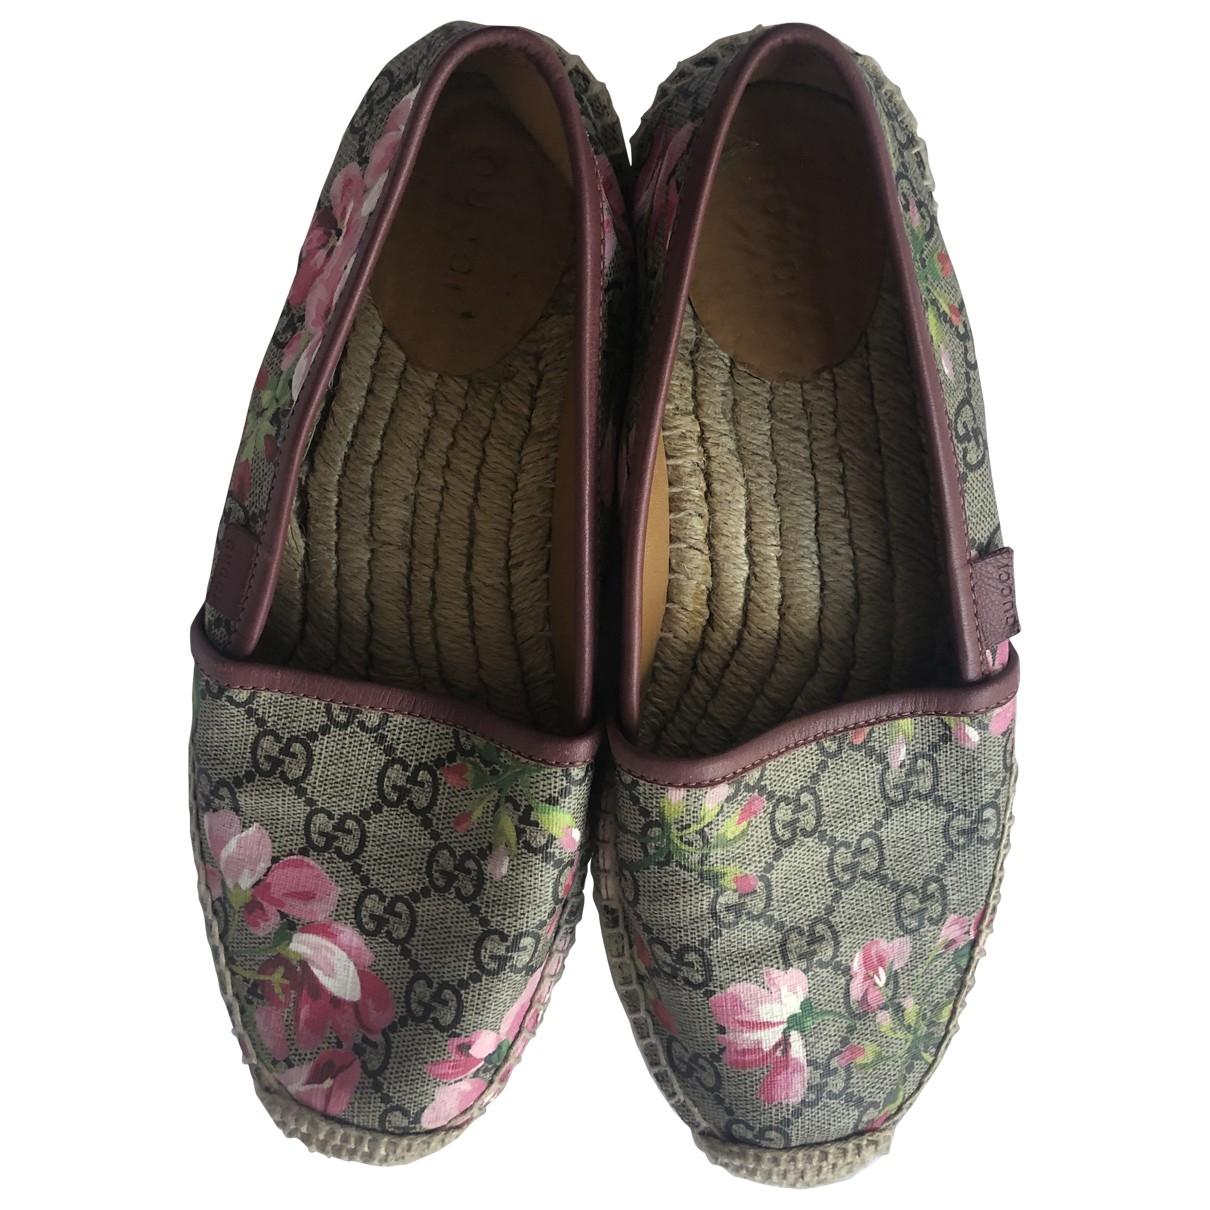 Gucci \N Beige Cloth Espadrilles for Women 38.5 EU